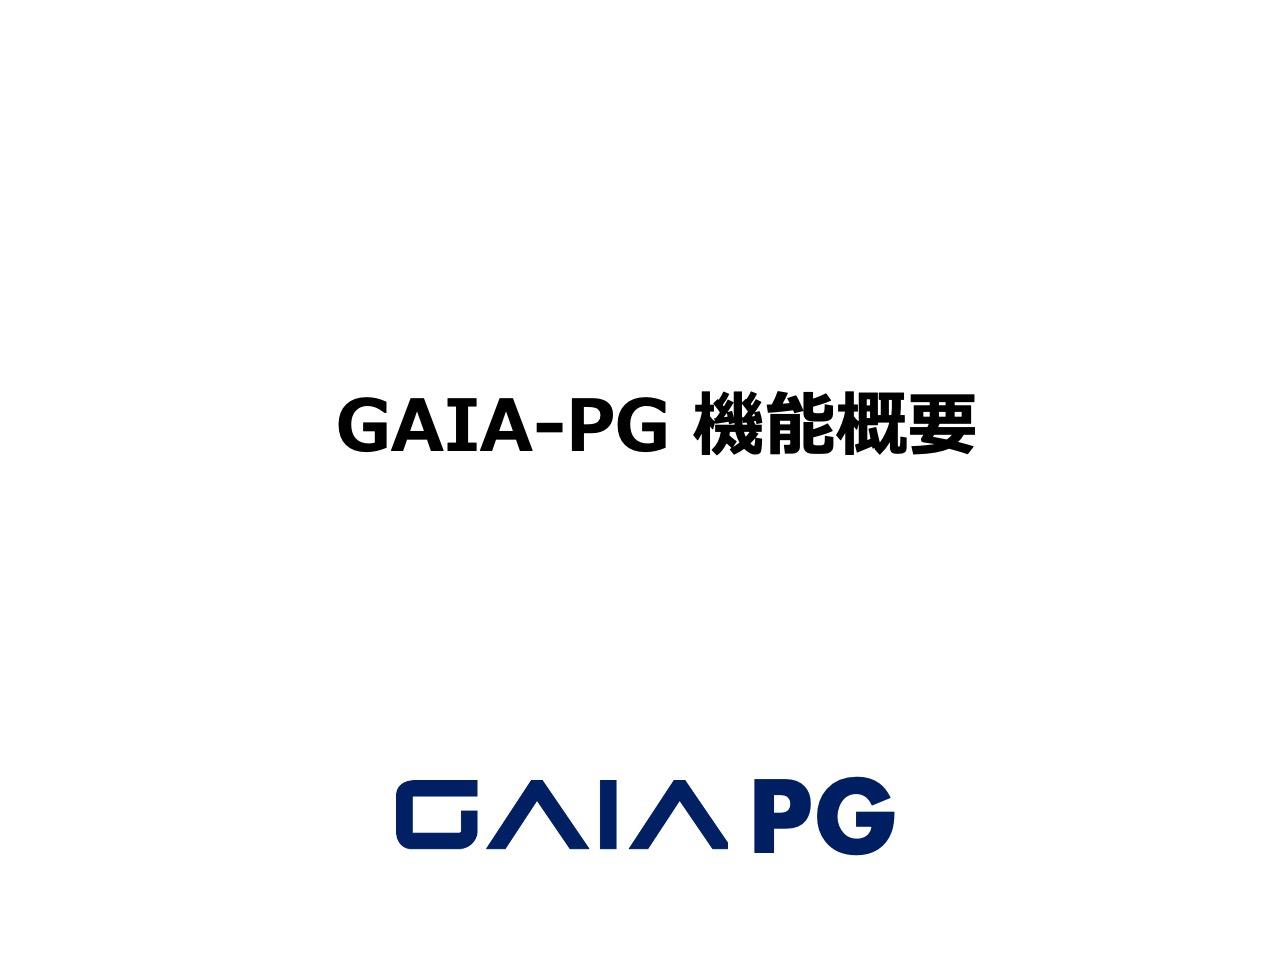 07-GAIAーPG機能概要20200507pptx